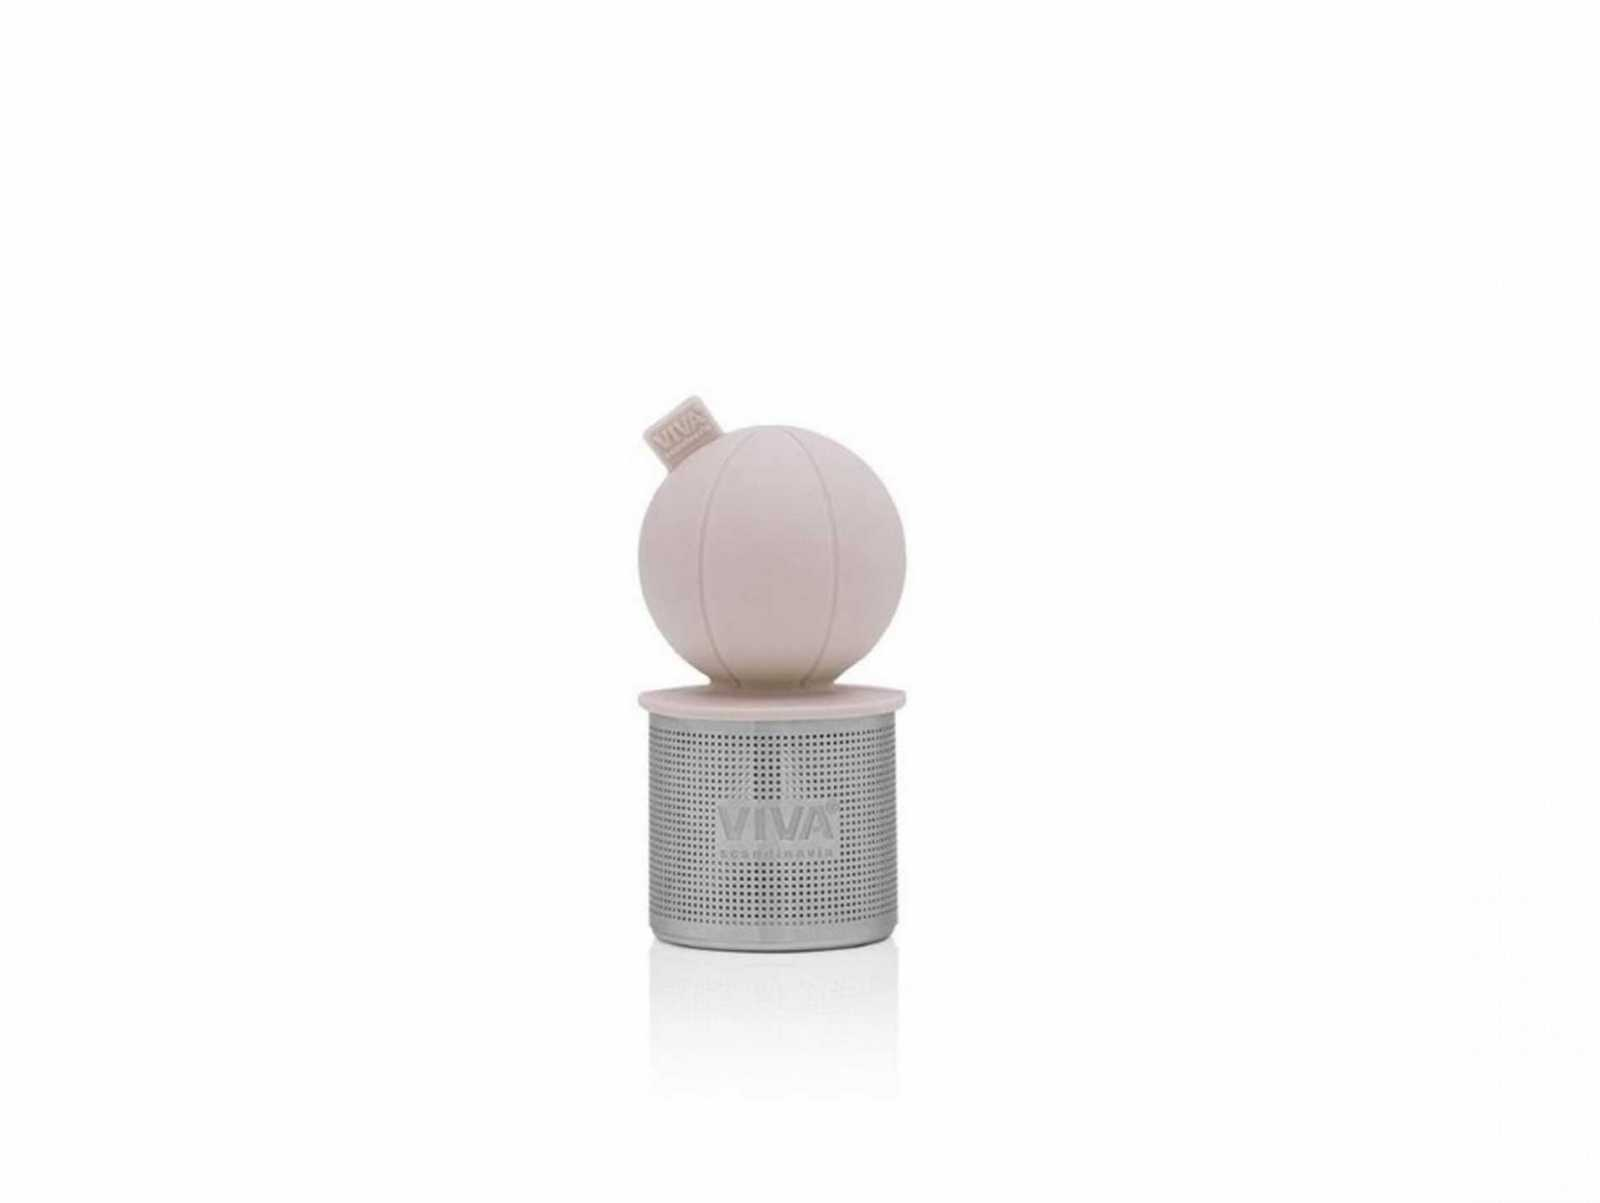 Онлайн каталог PROMENU: Ситечко для заварки чая Viva Scandinavia INFUSION Peach, розовый                               V77649